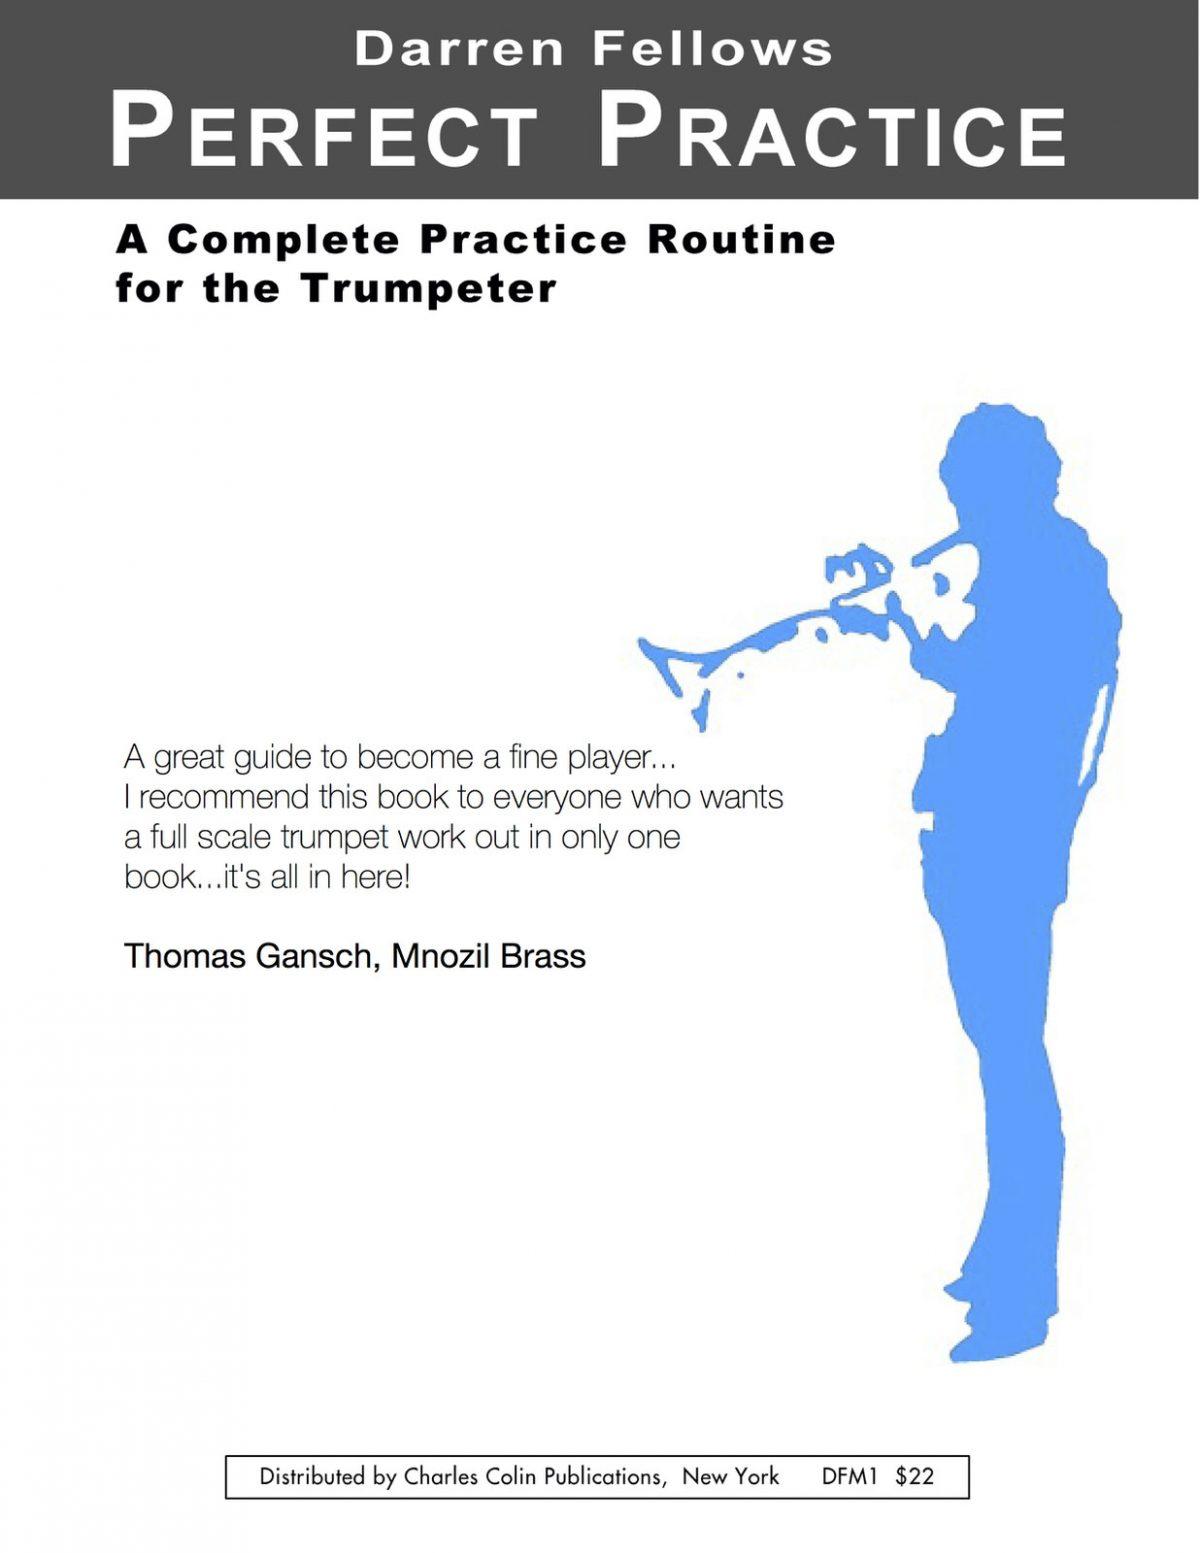 Fellows, New Studies aka Perfect Practice